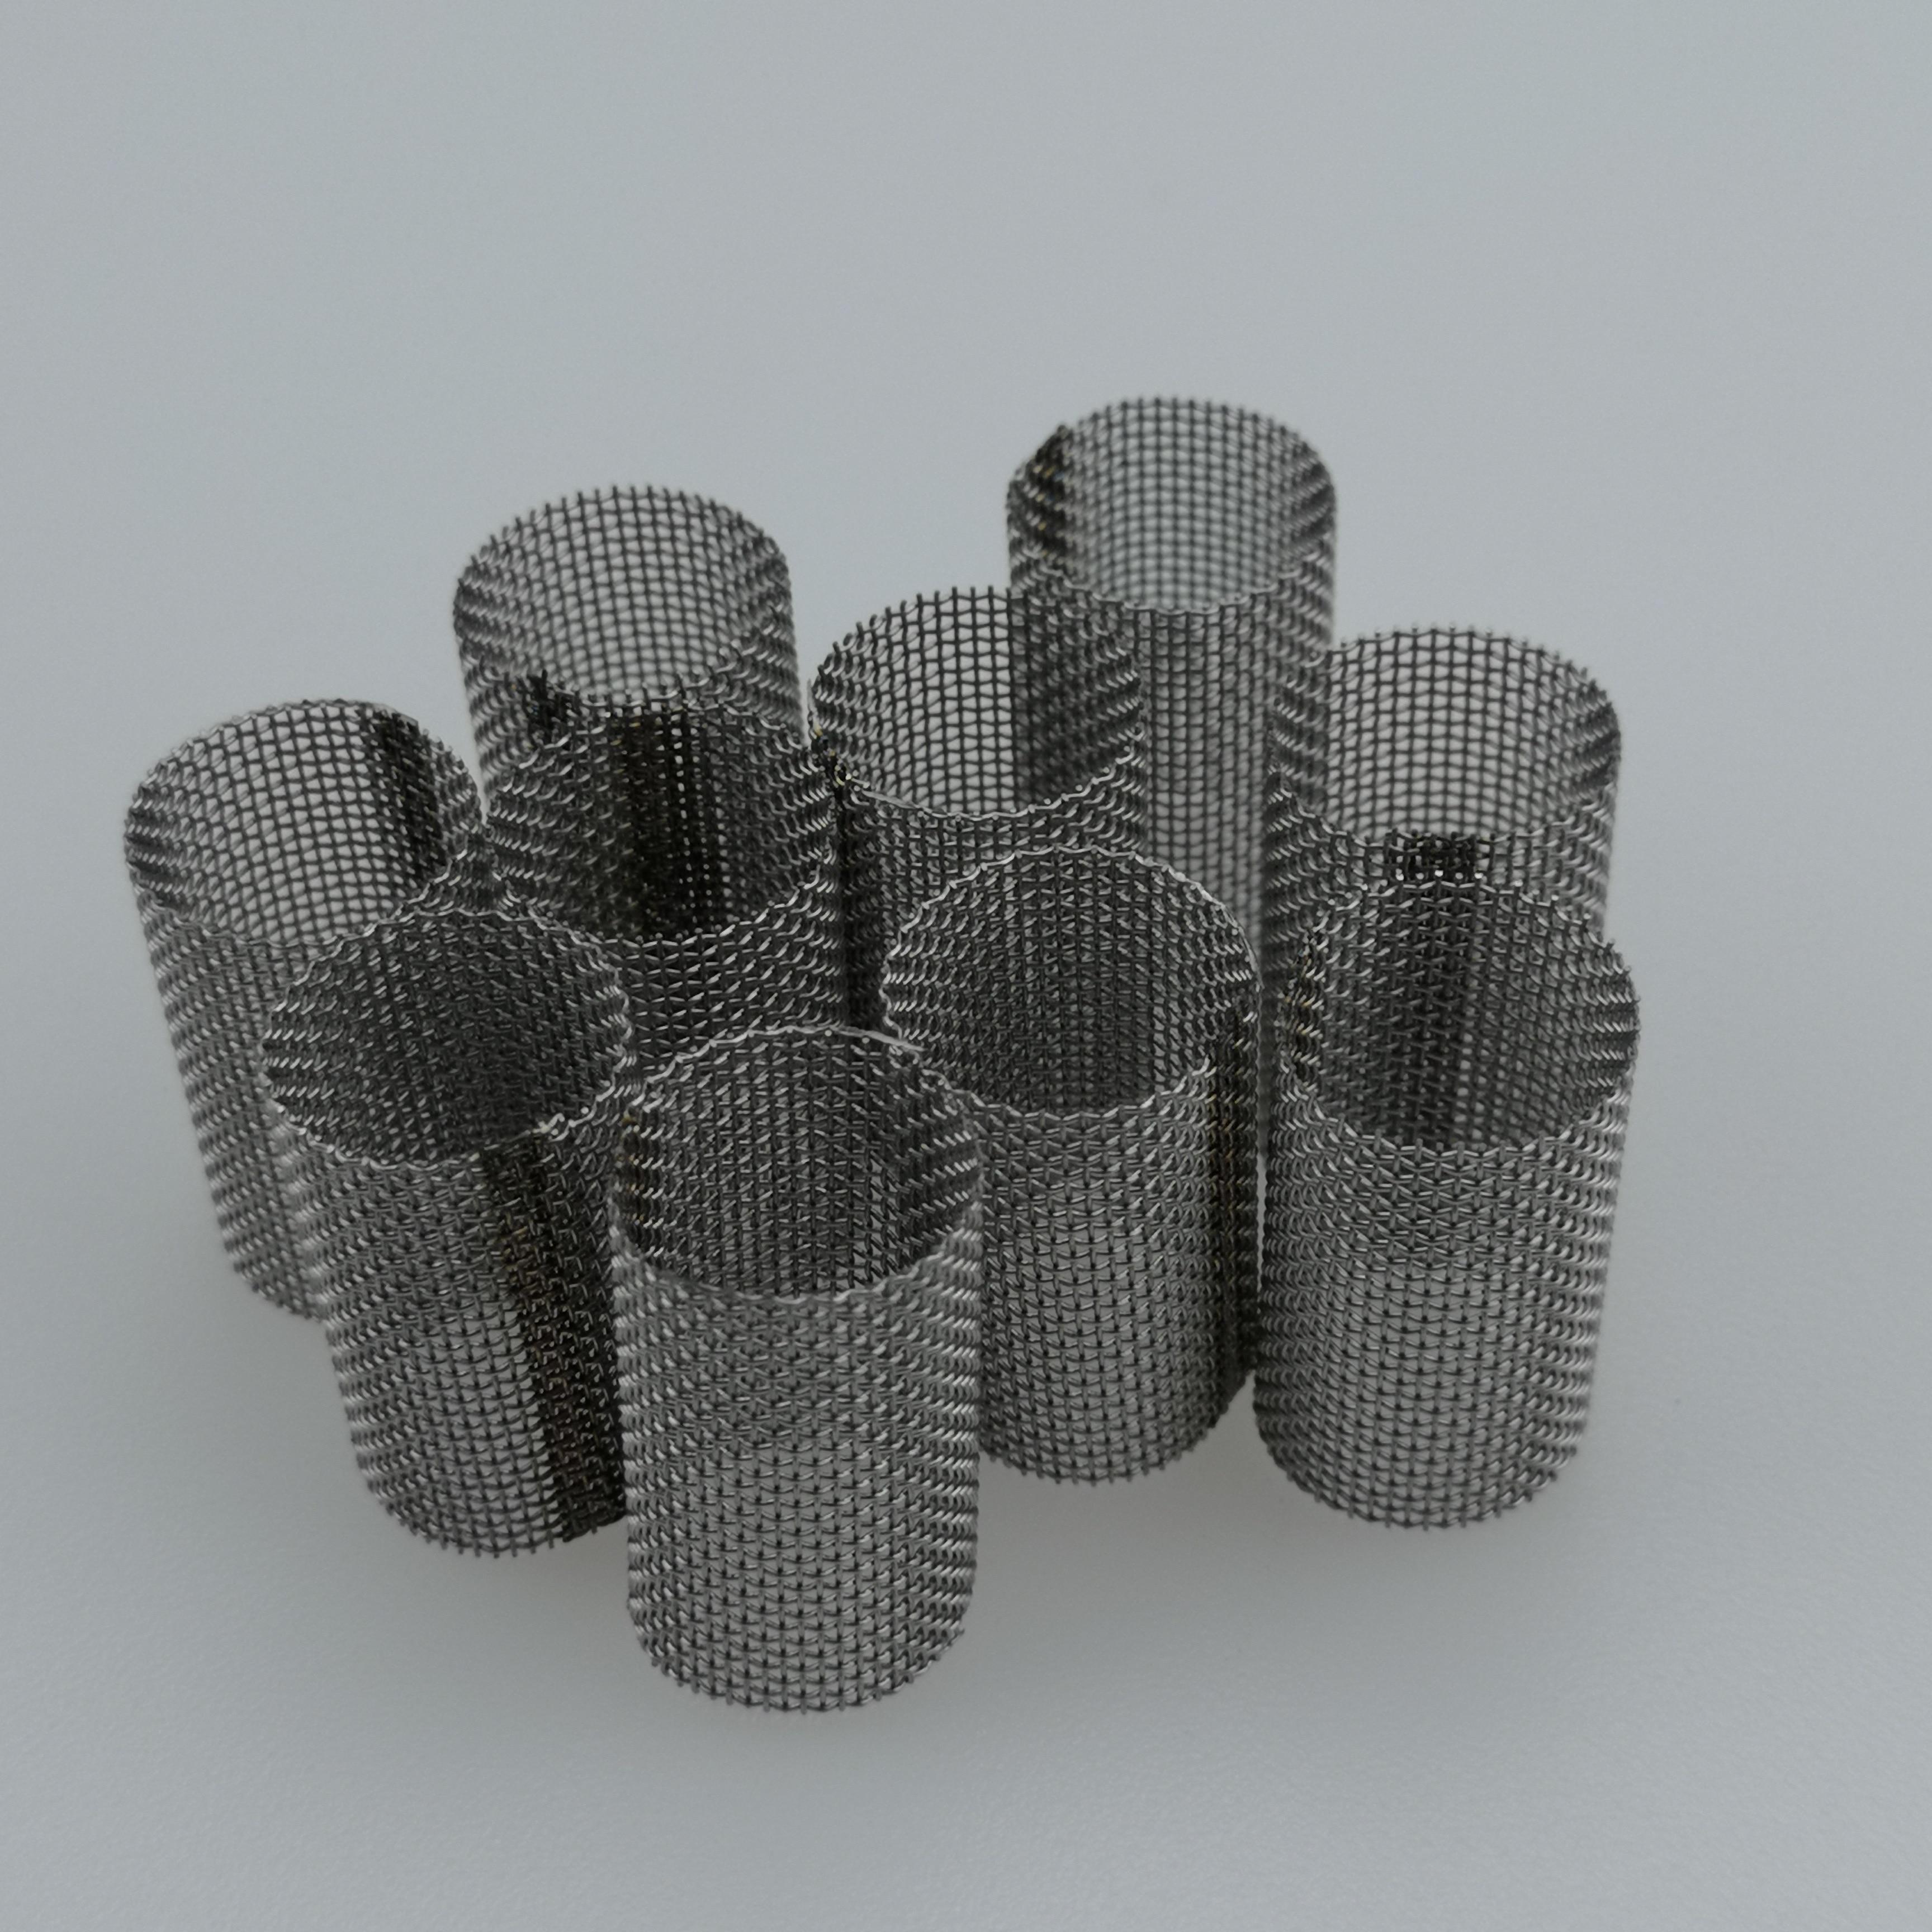 246358 60 mesh Check Valve Filter Screen Kits,10 Pack Fits Graco Fusion AP Gun